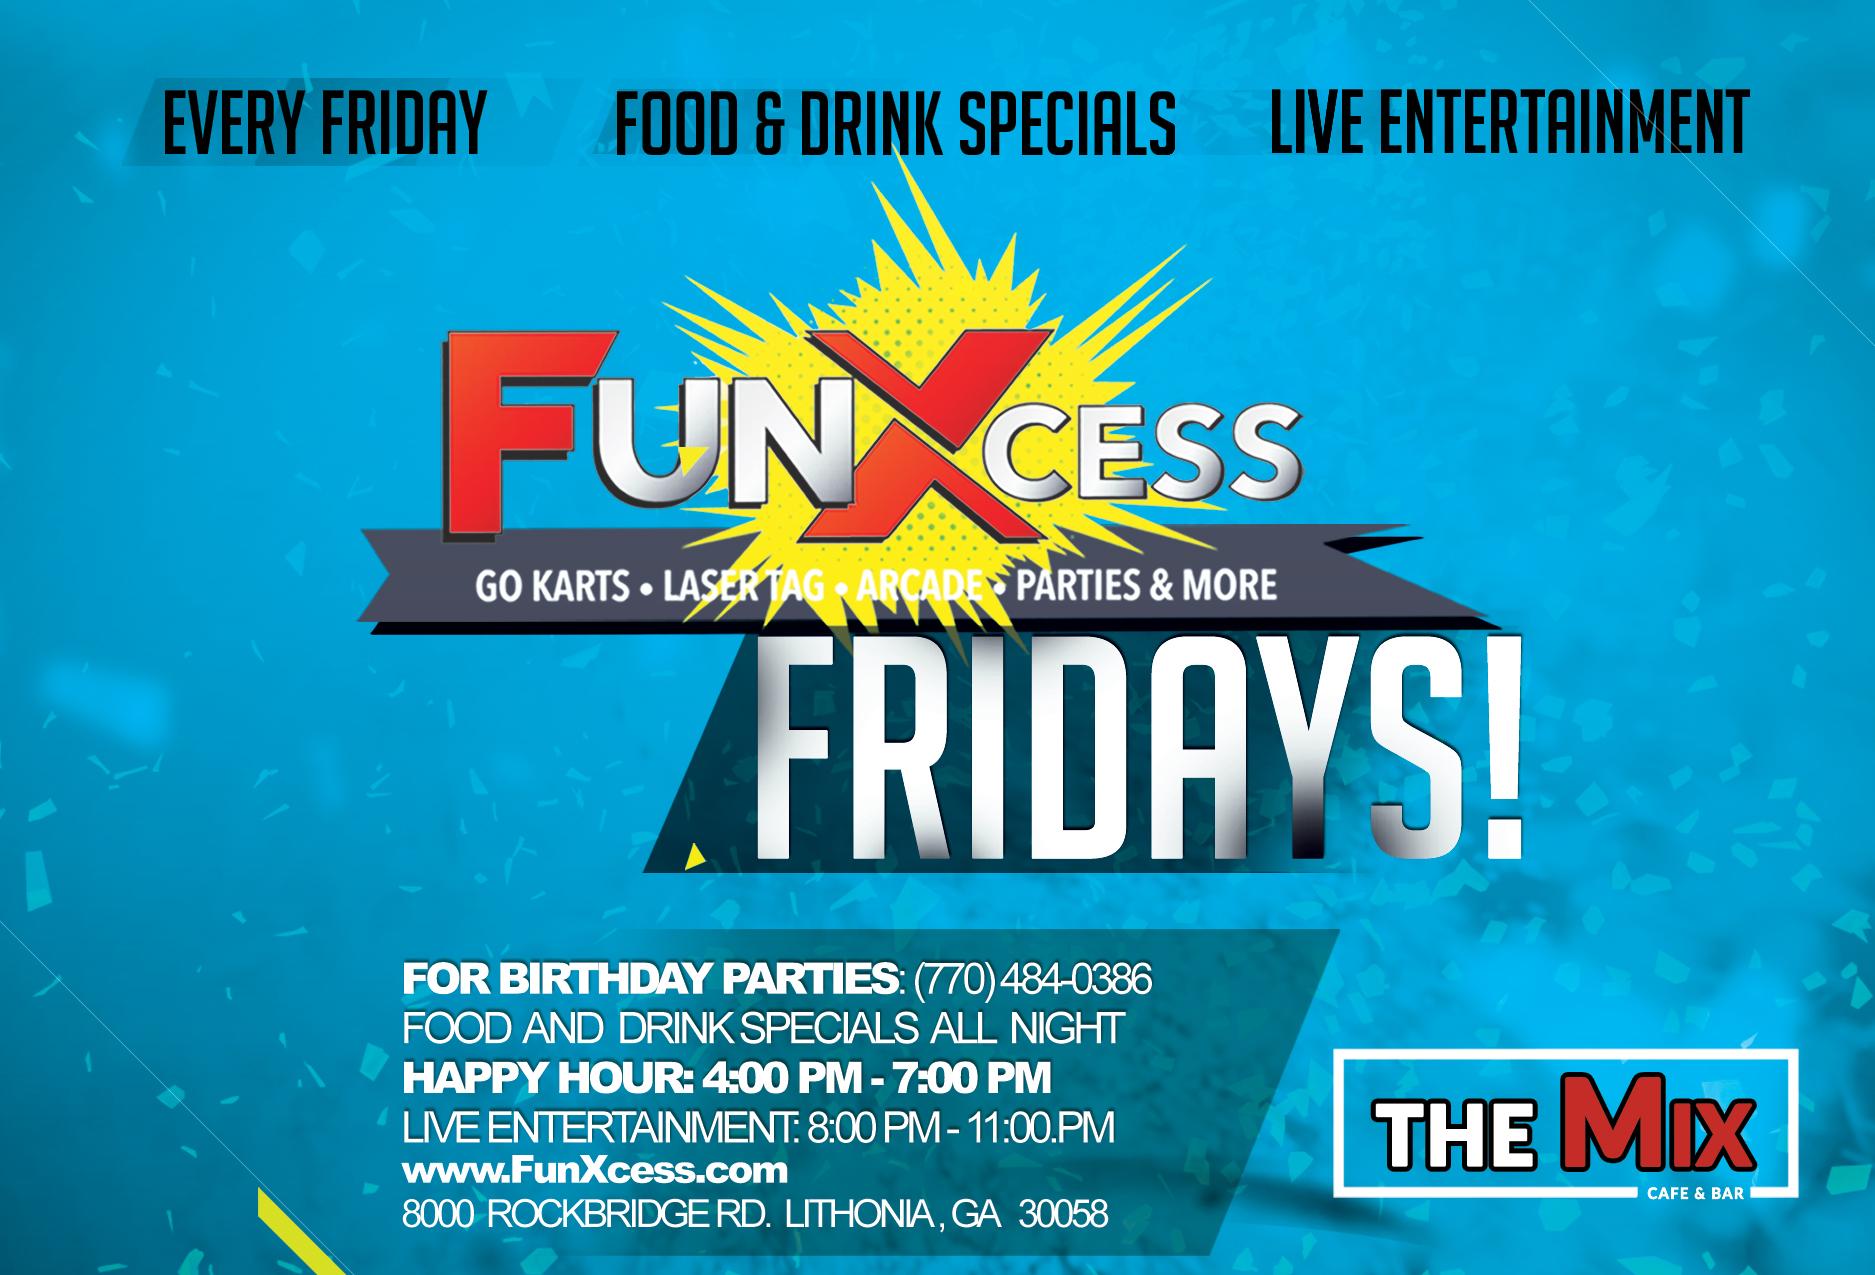 FunXcess-Fridays-2.jpg